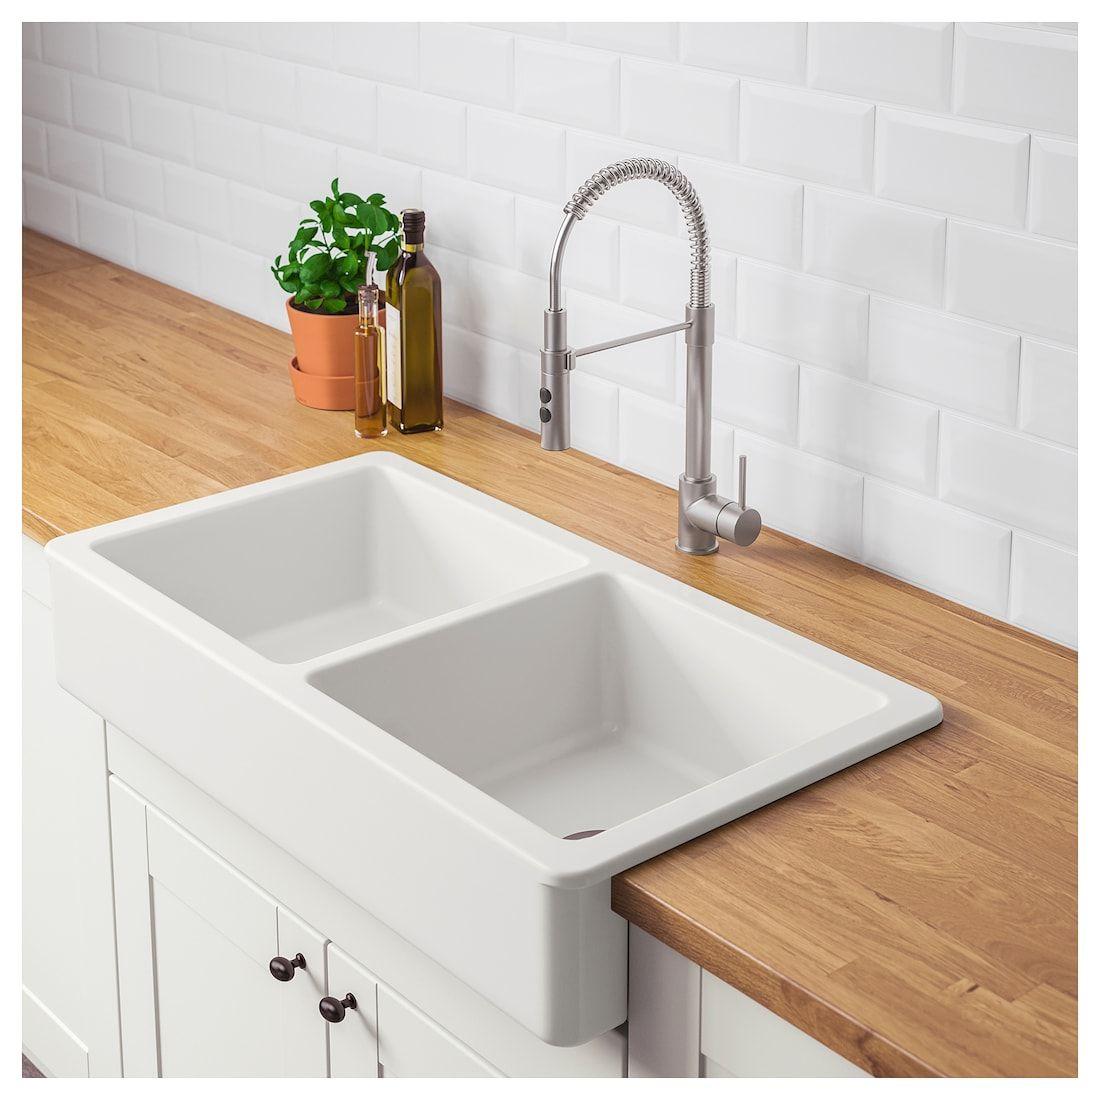 Havsen Apron Front Double Bowl Sink White 37x19 In 2020